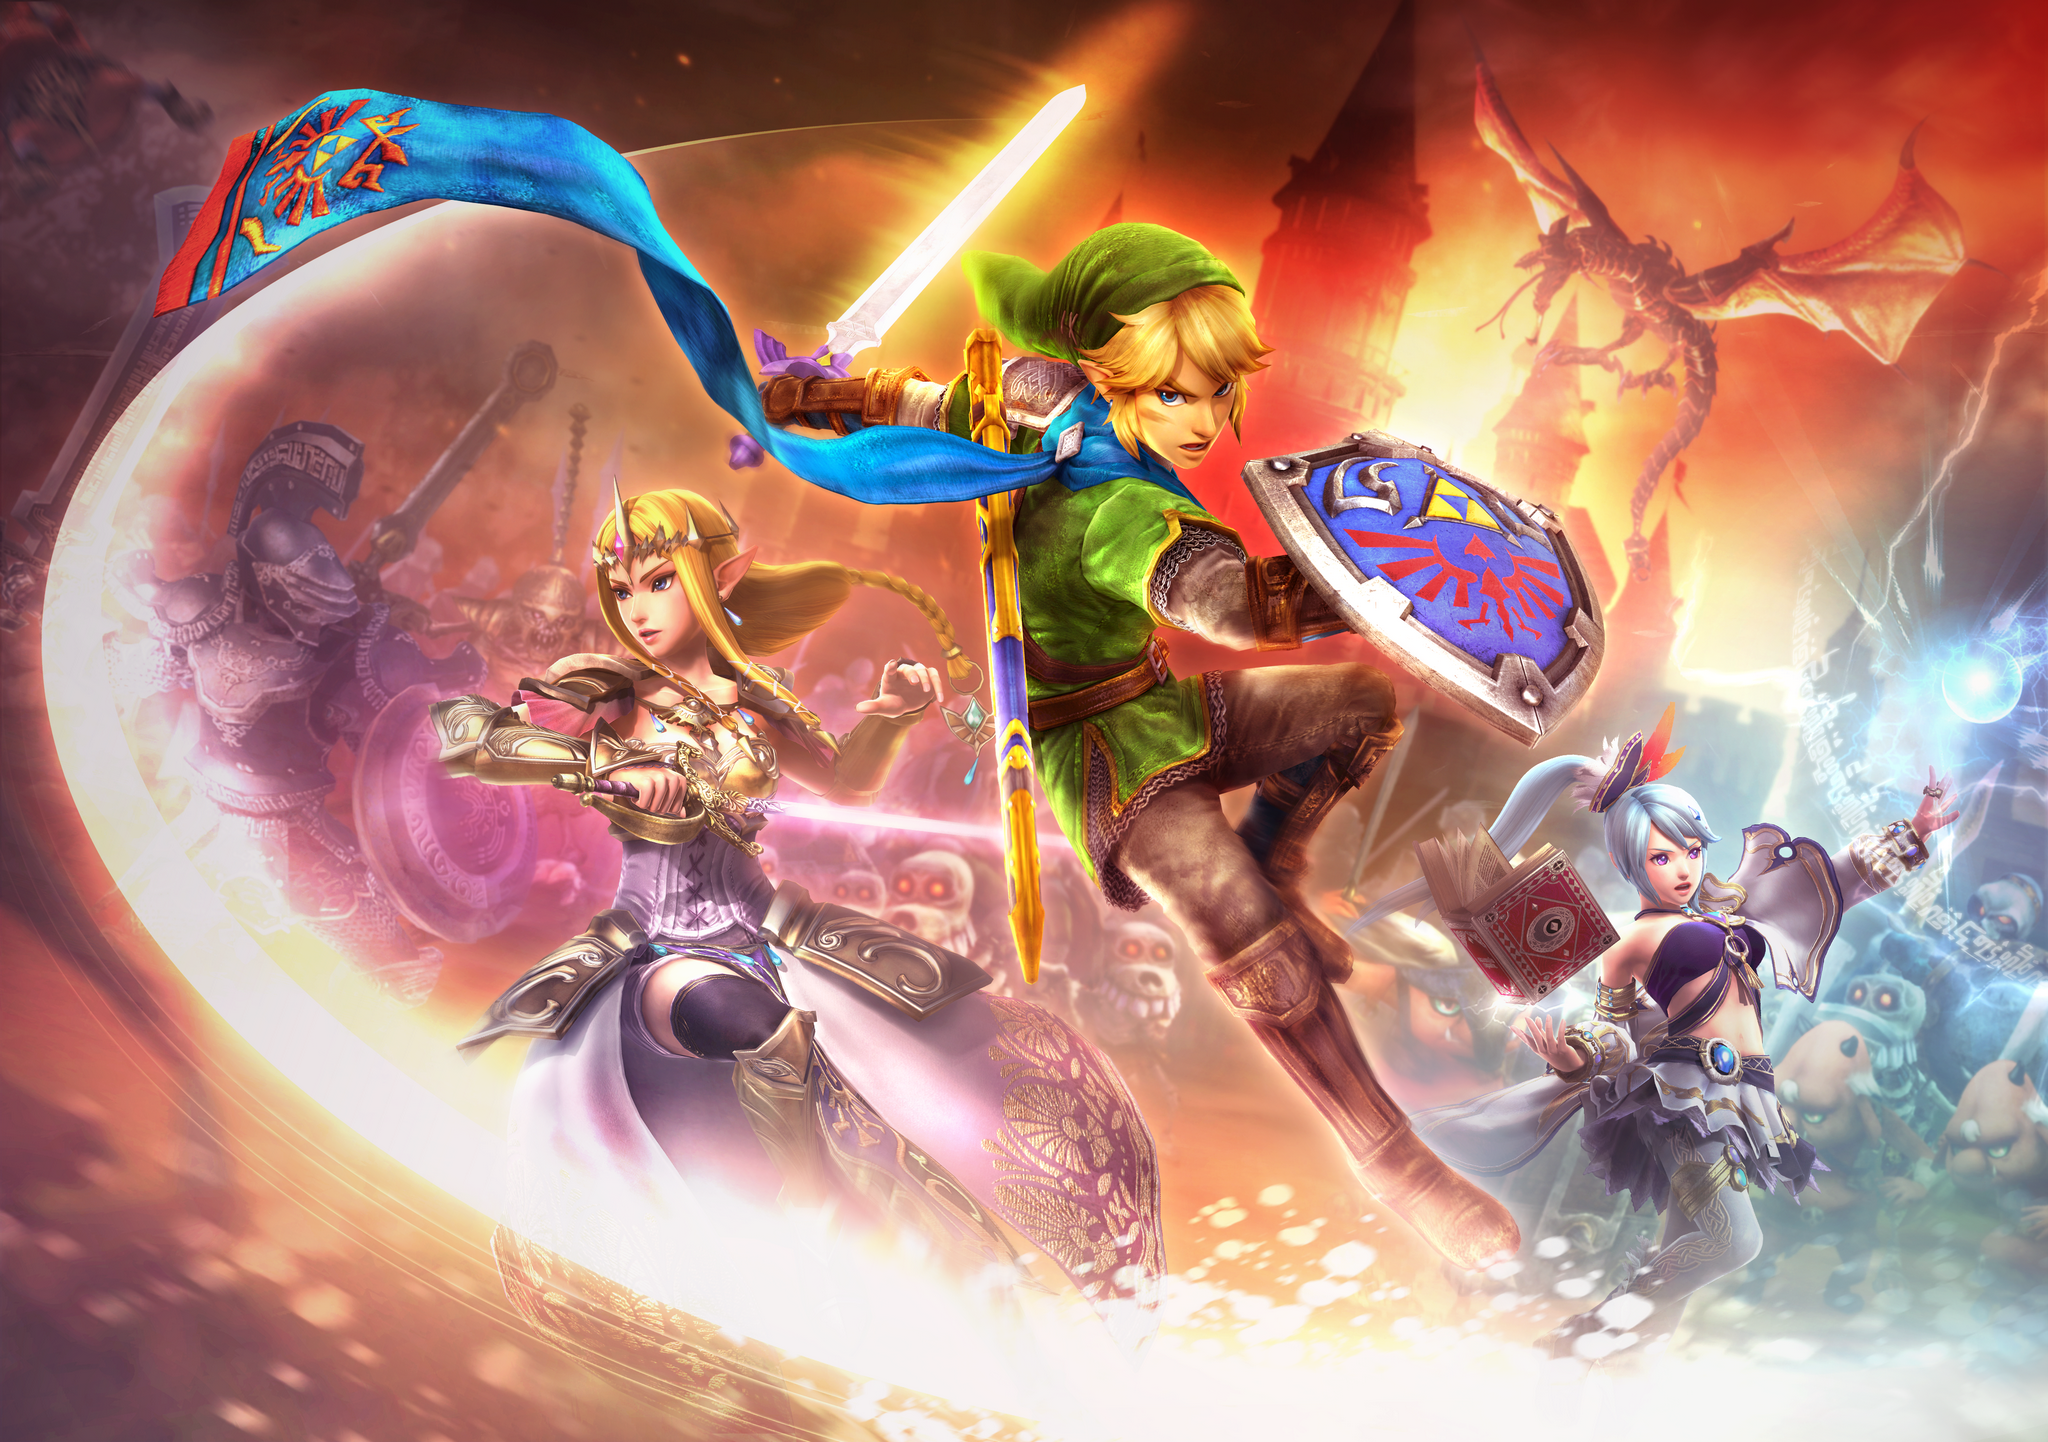 Zelda Hyrule Warriors official HD wallpaper - Release September 26th